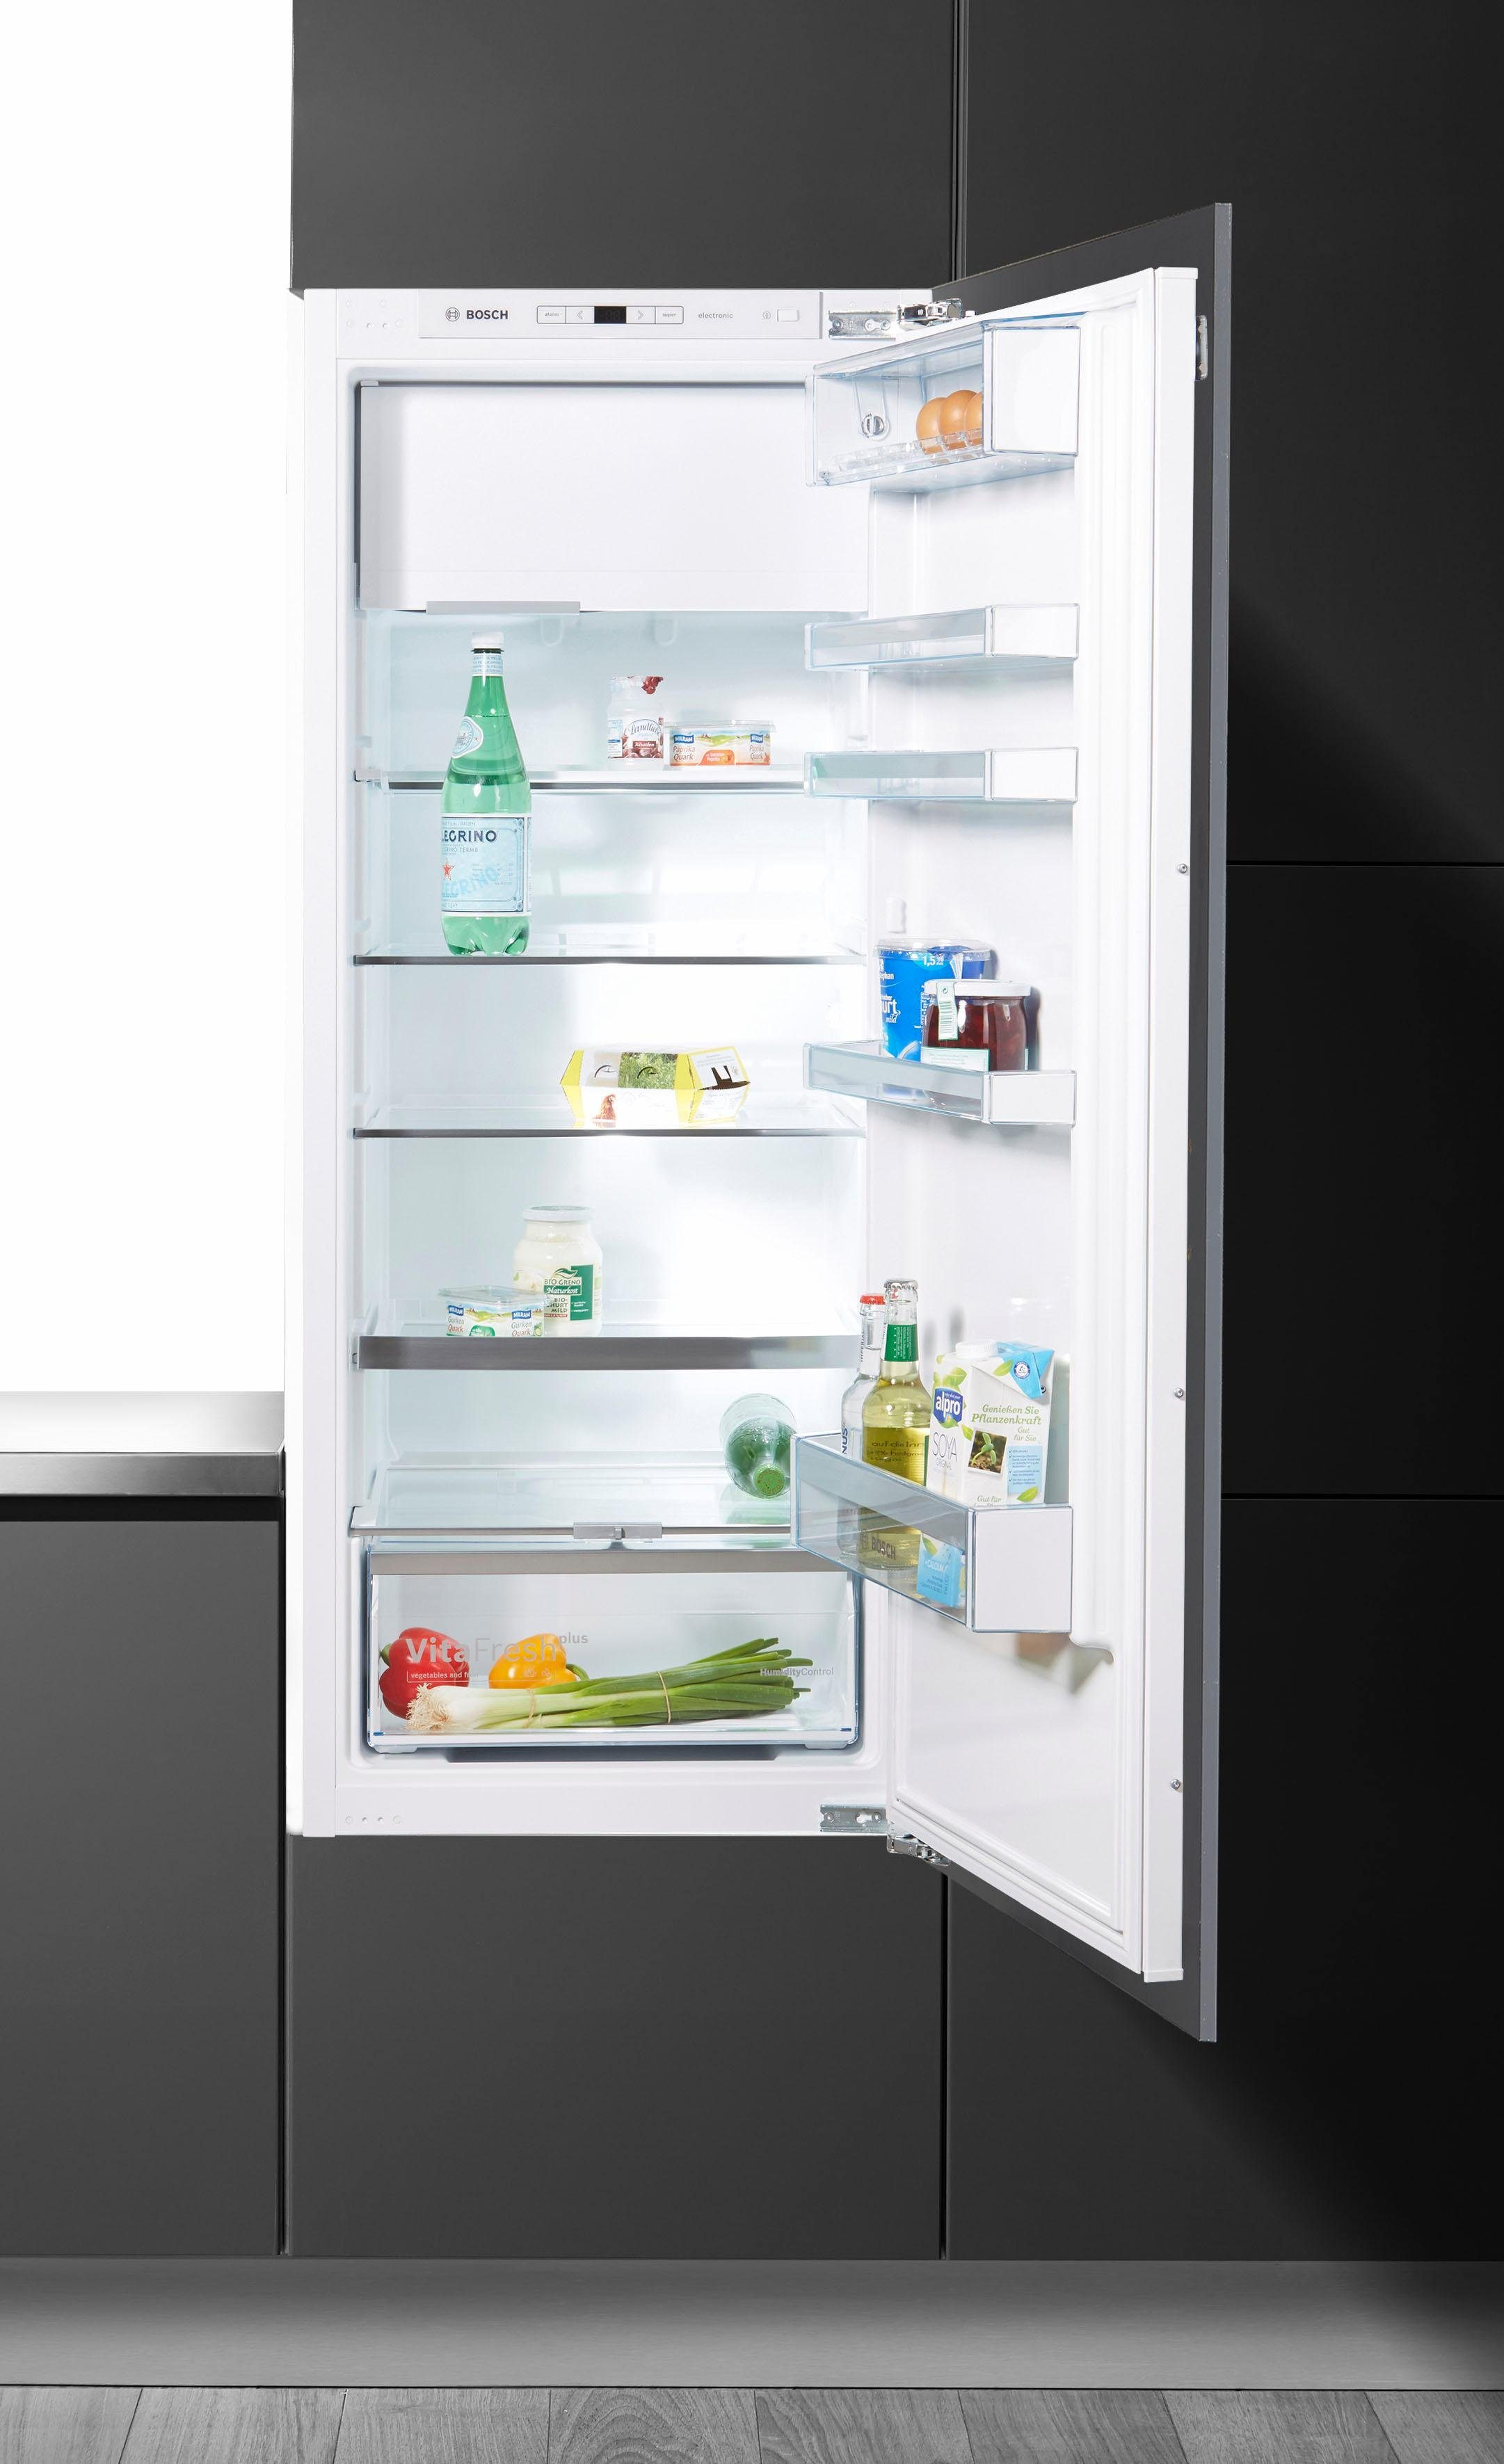 BOSCH Einbaukühlschrank KIL52AF30, 139,7 cm hoch, 55,8 cm breit, A++, 139,7 cm hoch, vollintegrierbar